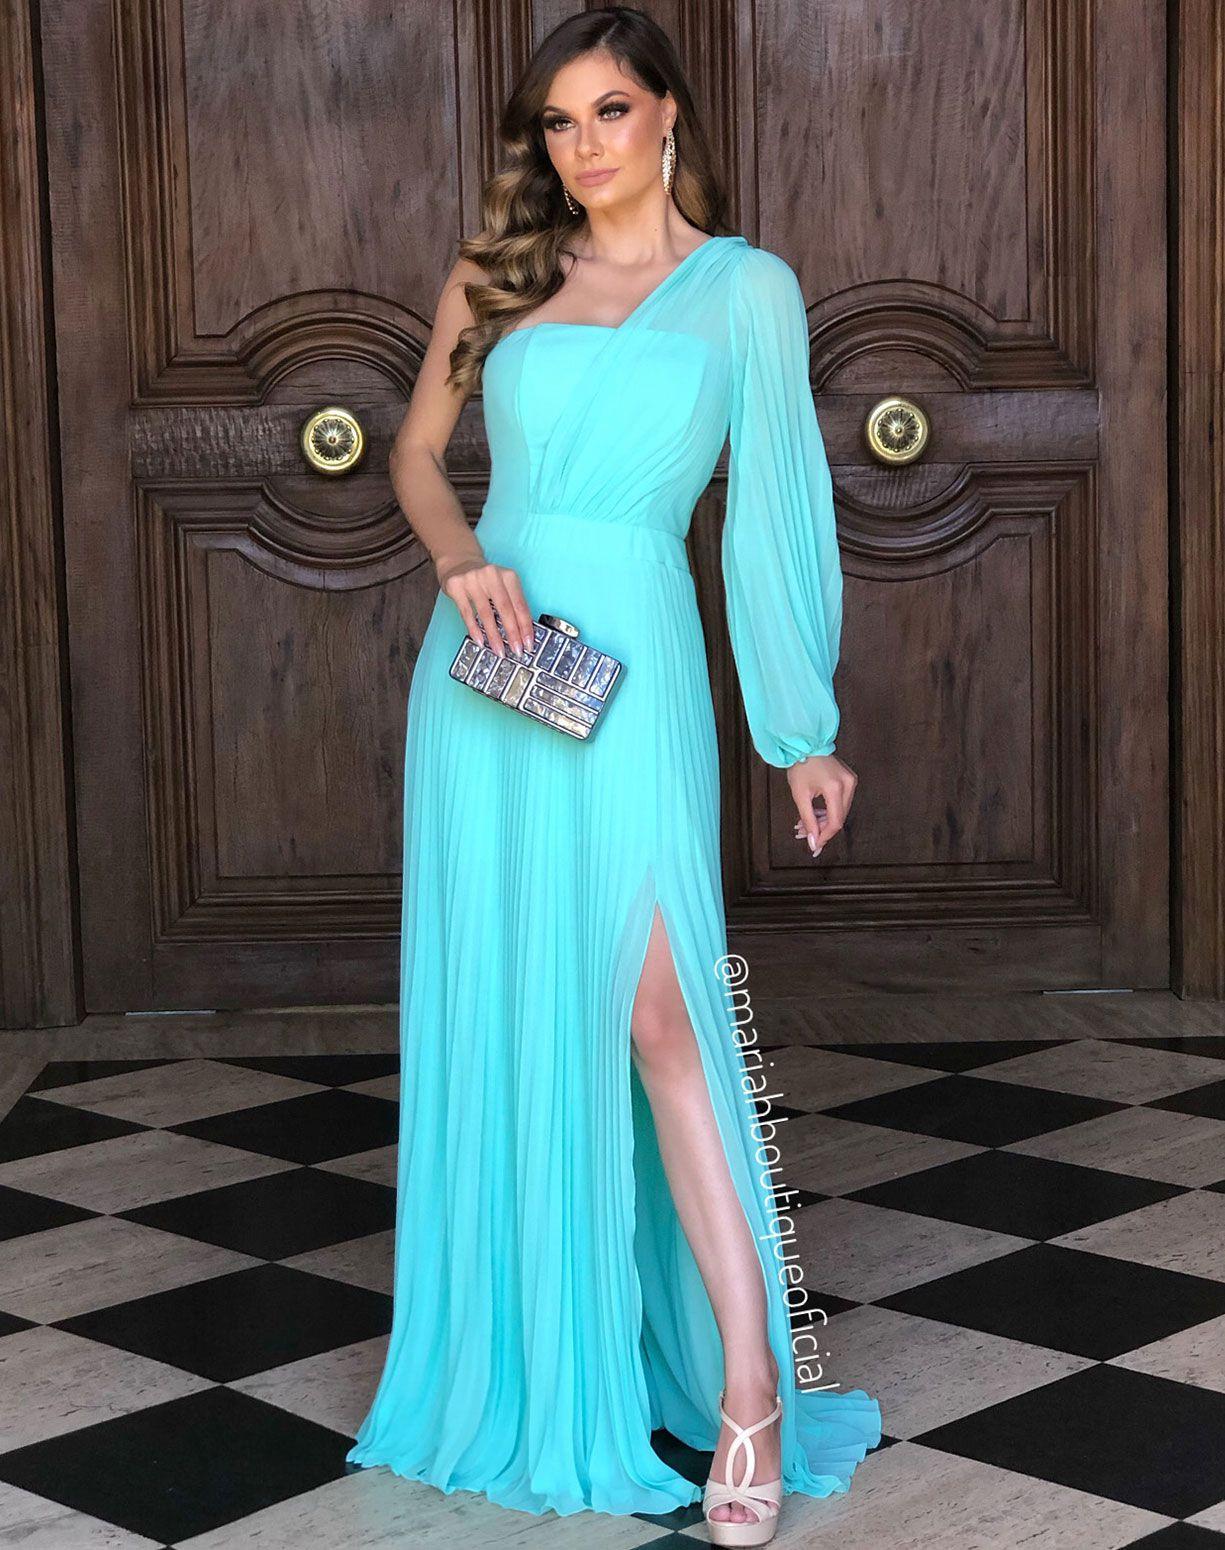 Vestido Tiffany Plissado de Um Ombro Só